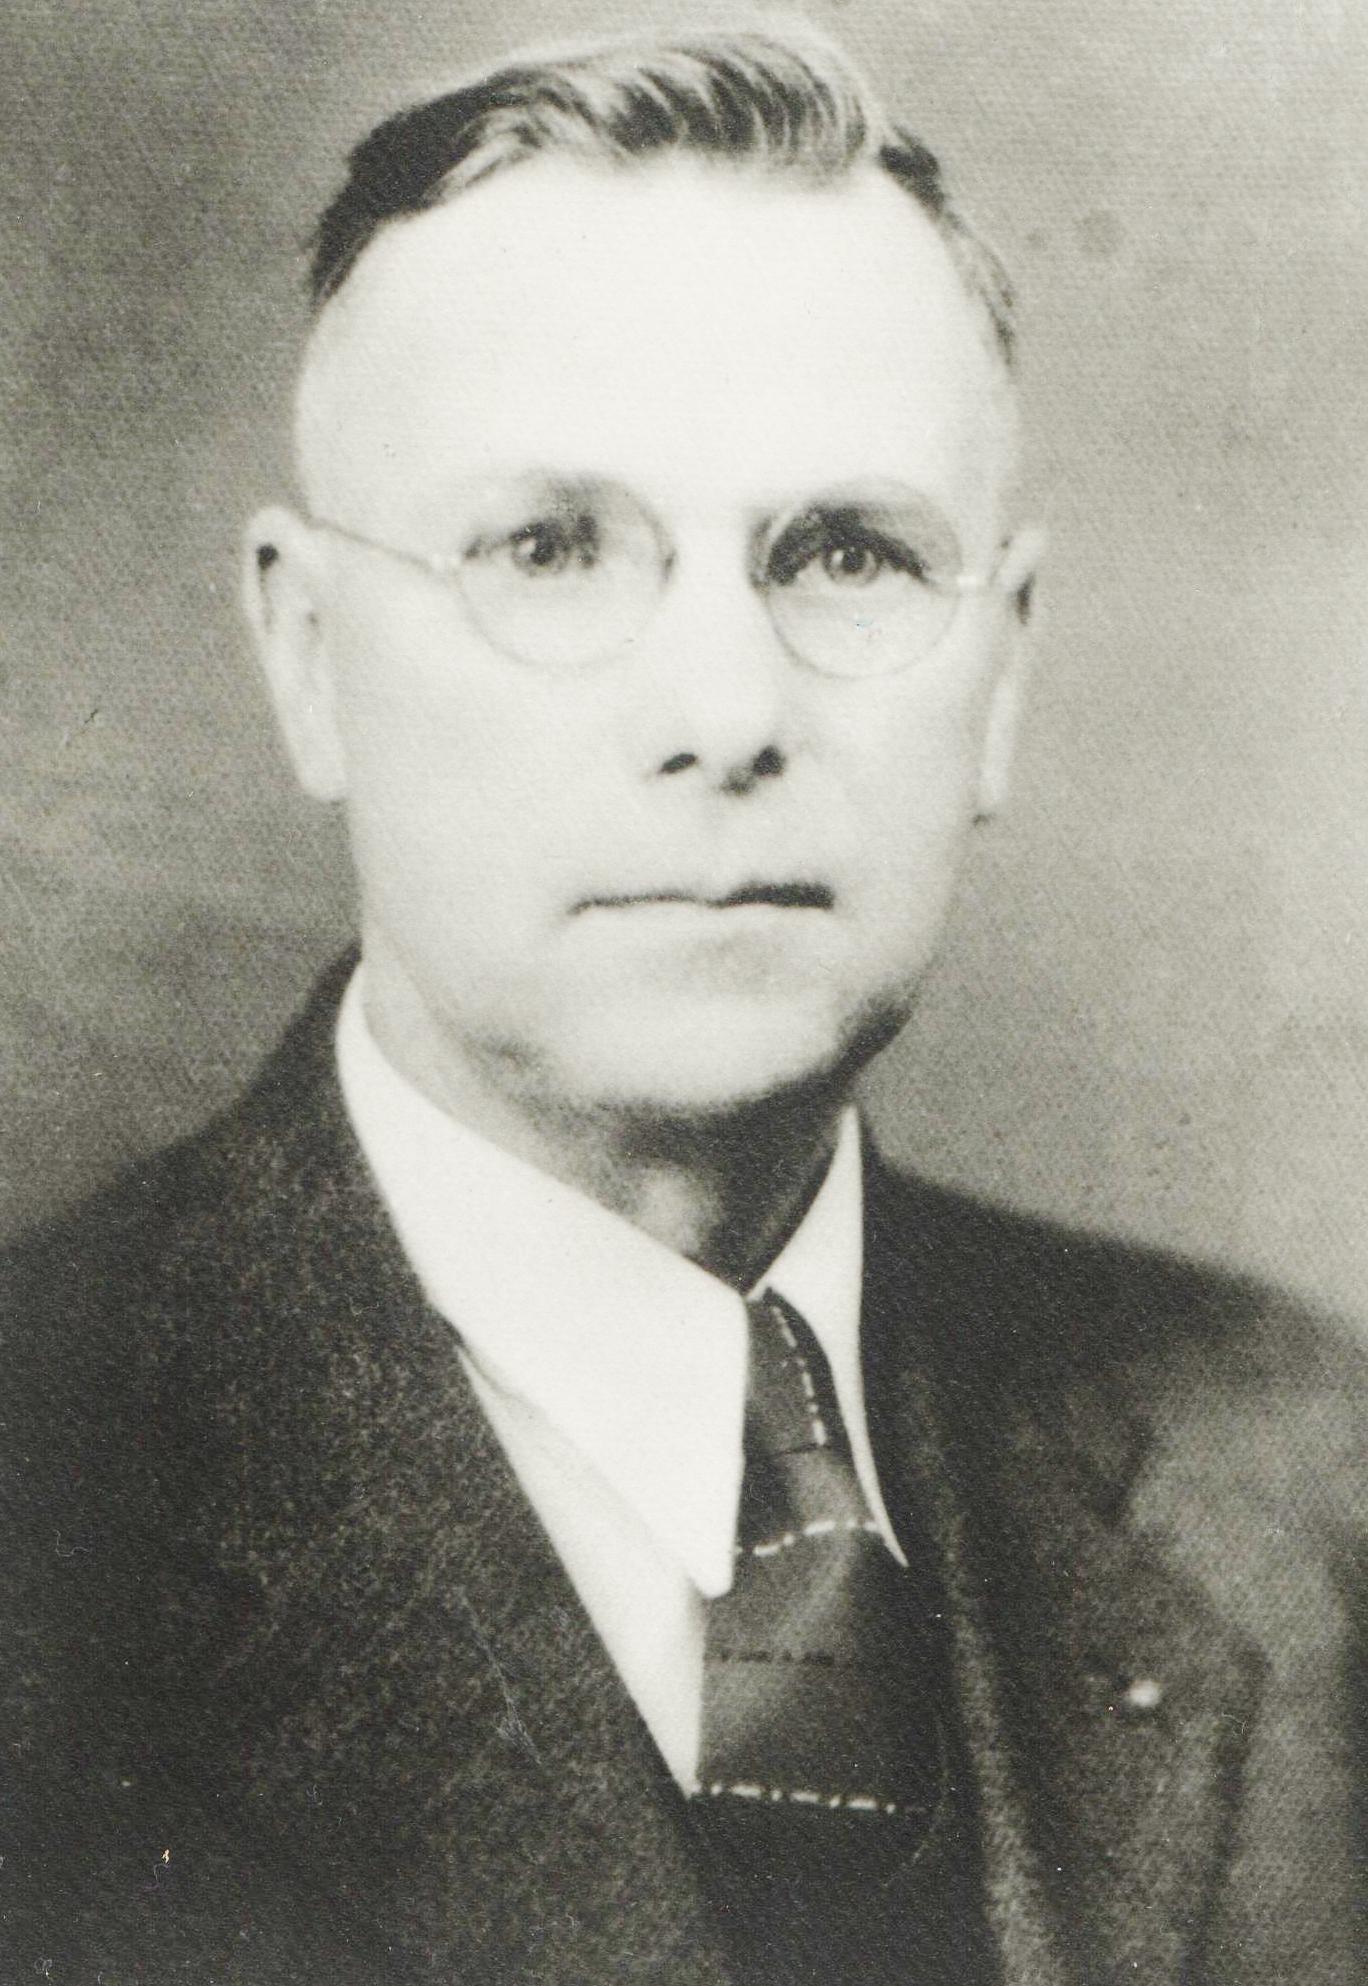 1942 H. H. Peterson